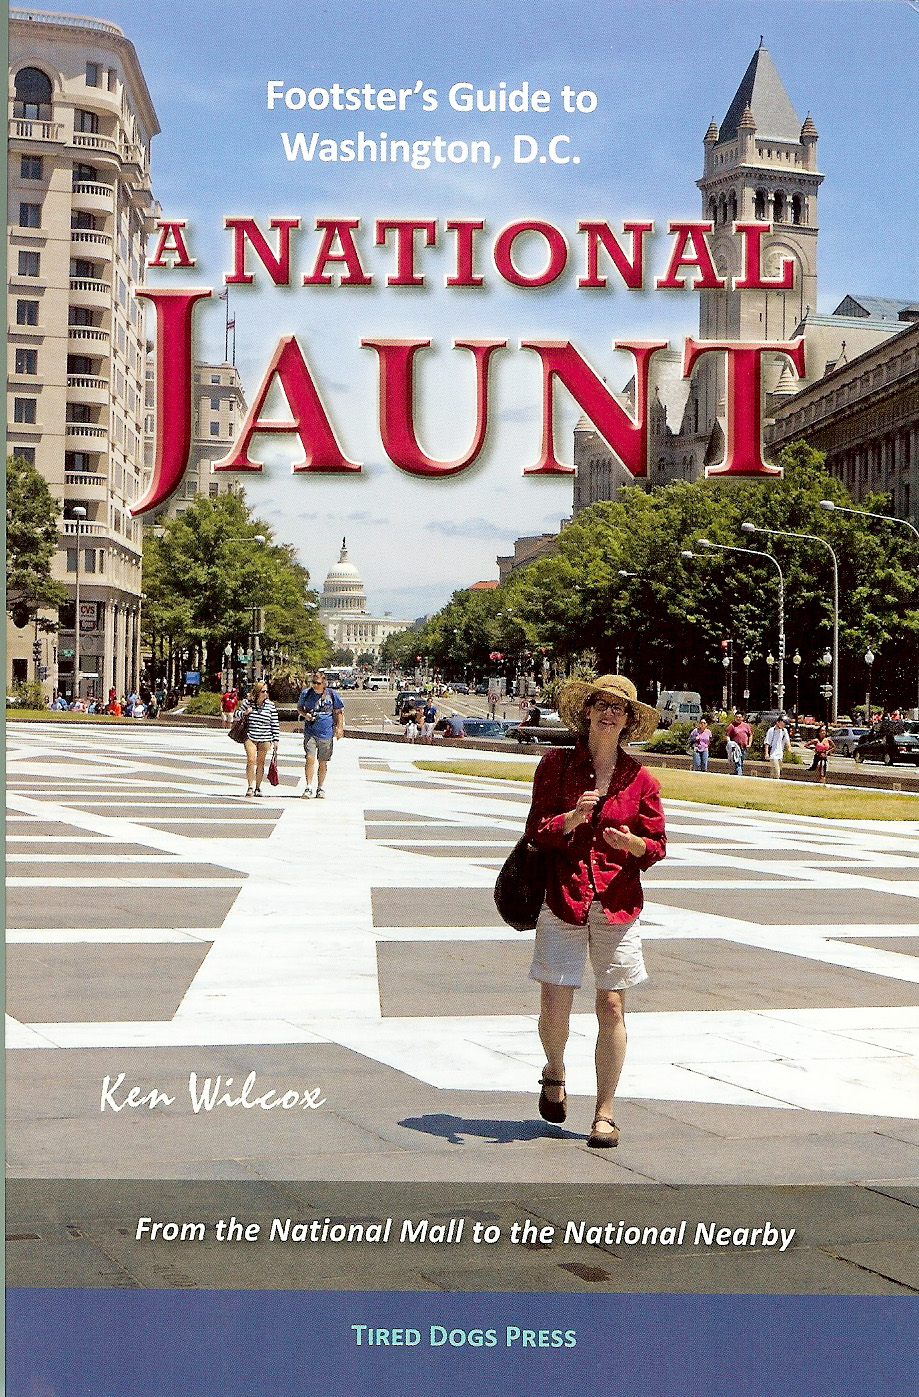 National Jaunt.jpg